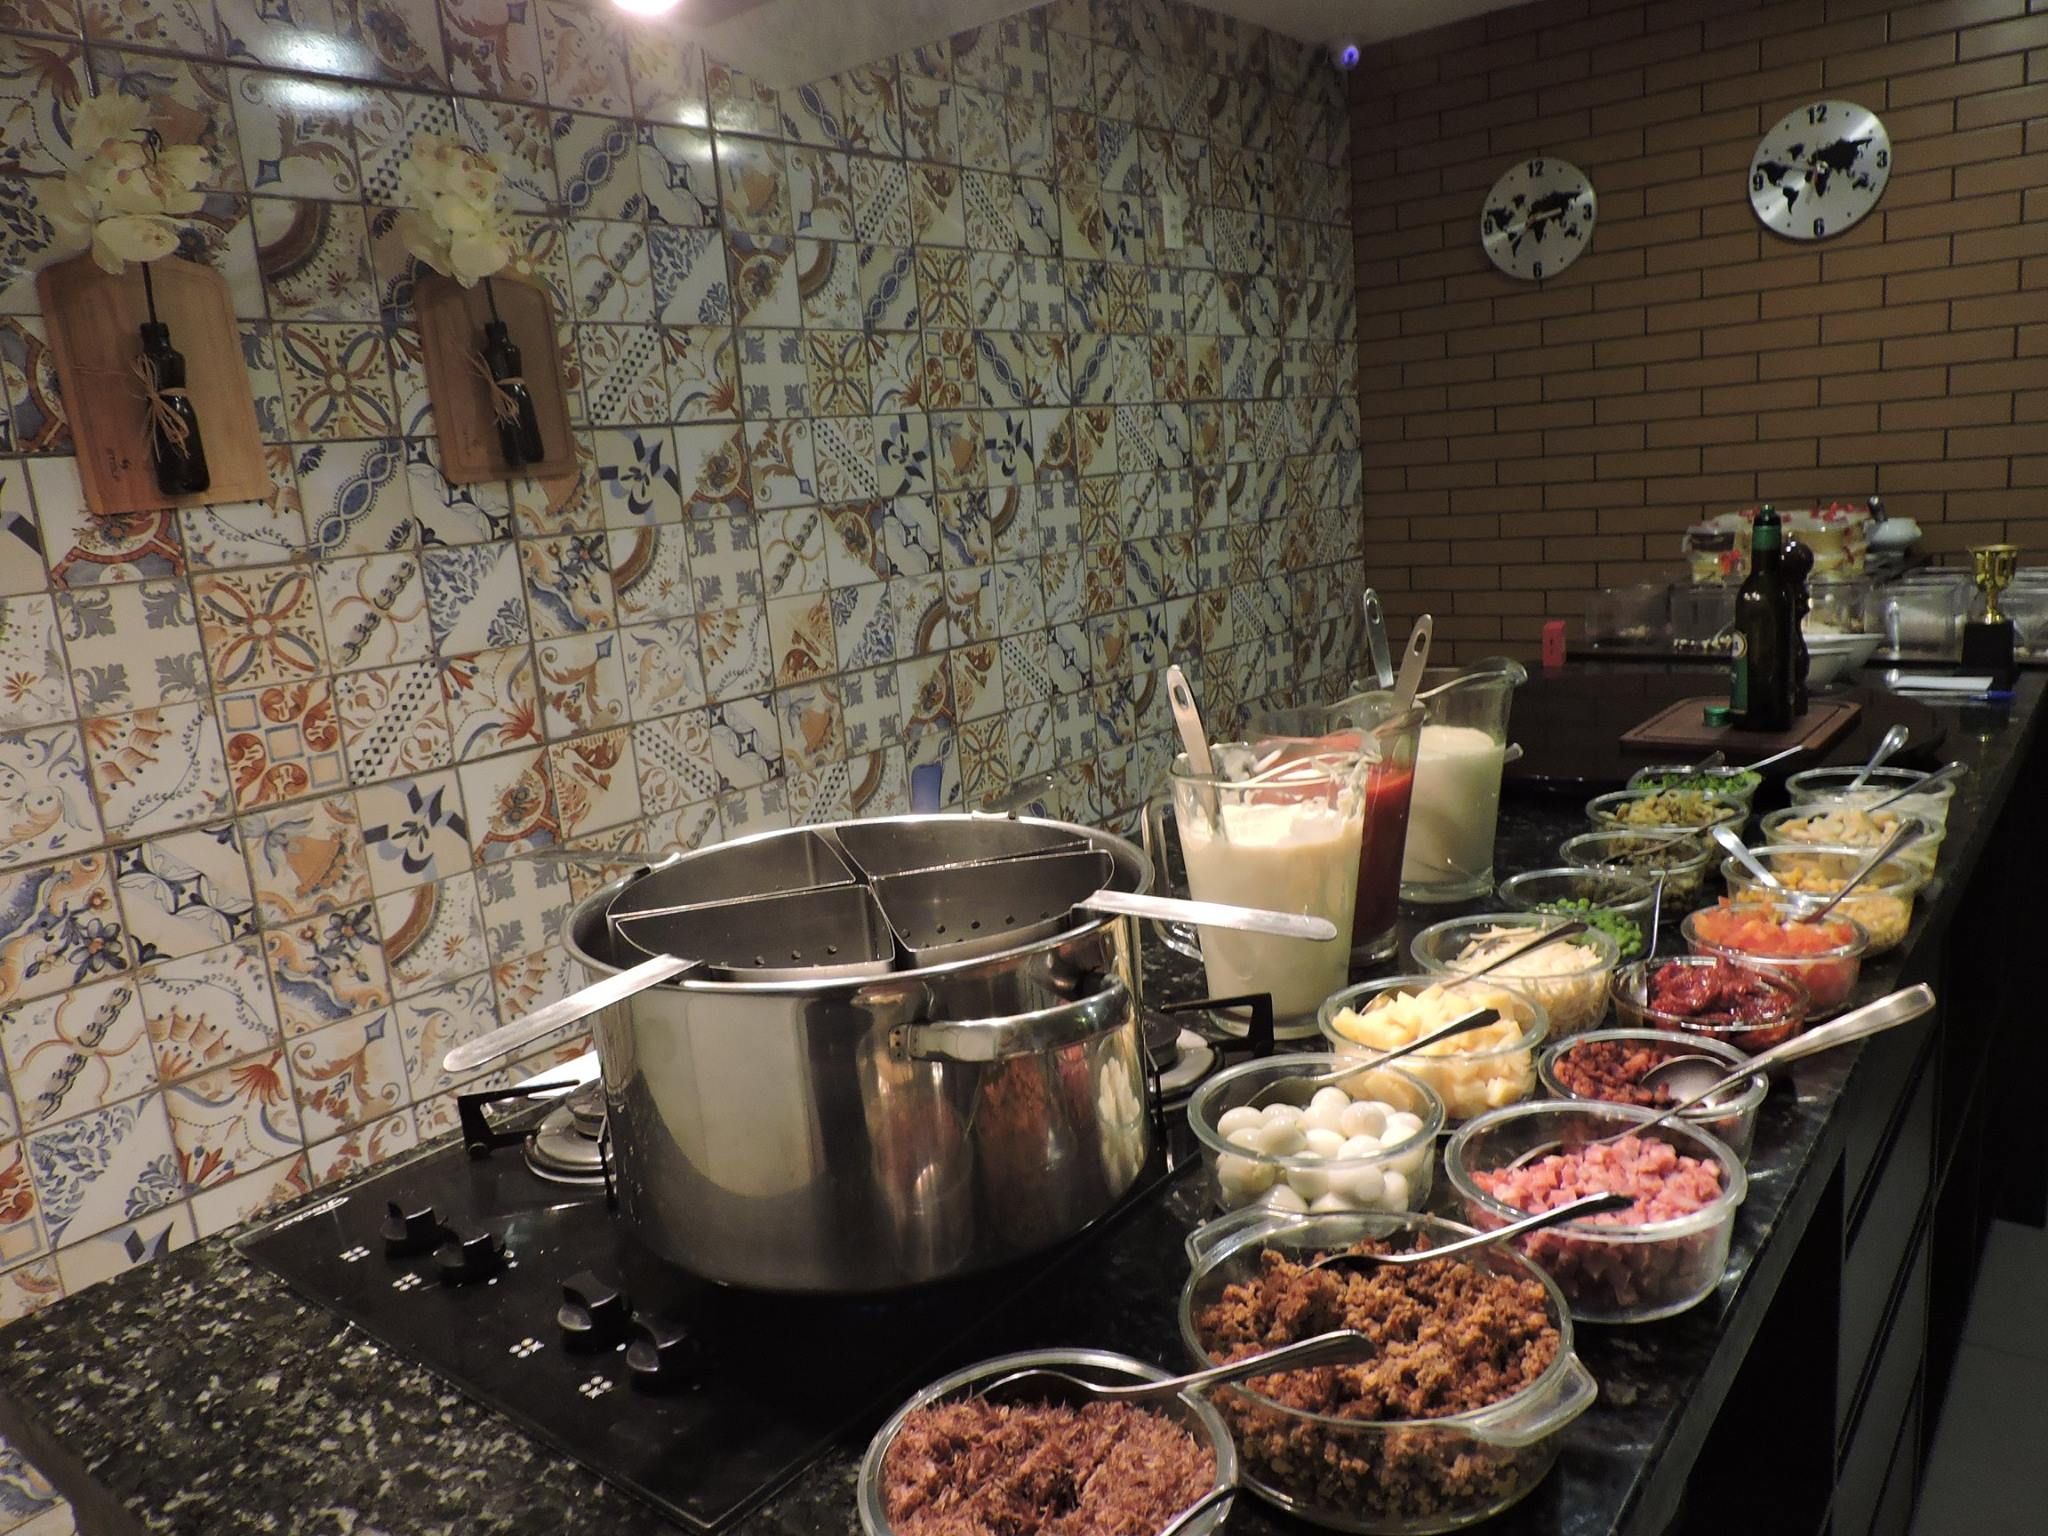 Fisk Caucaia/CE - Fisk Chef - Focus on Fisk Final 2017